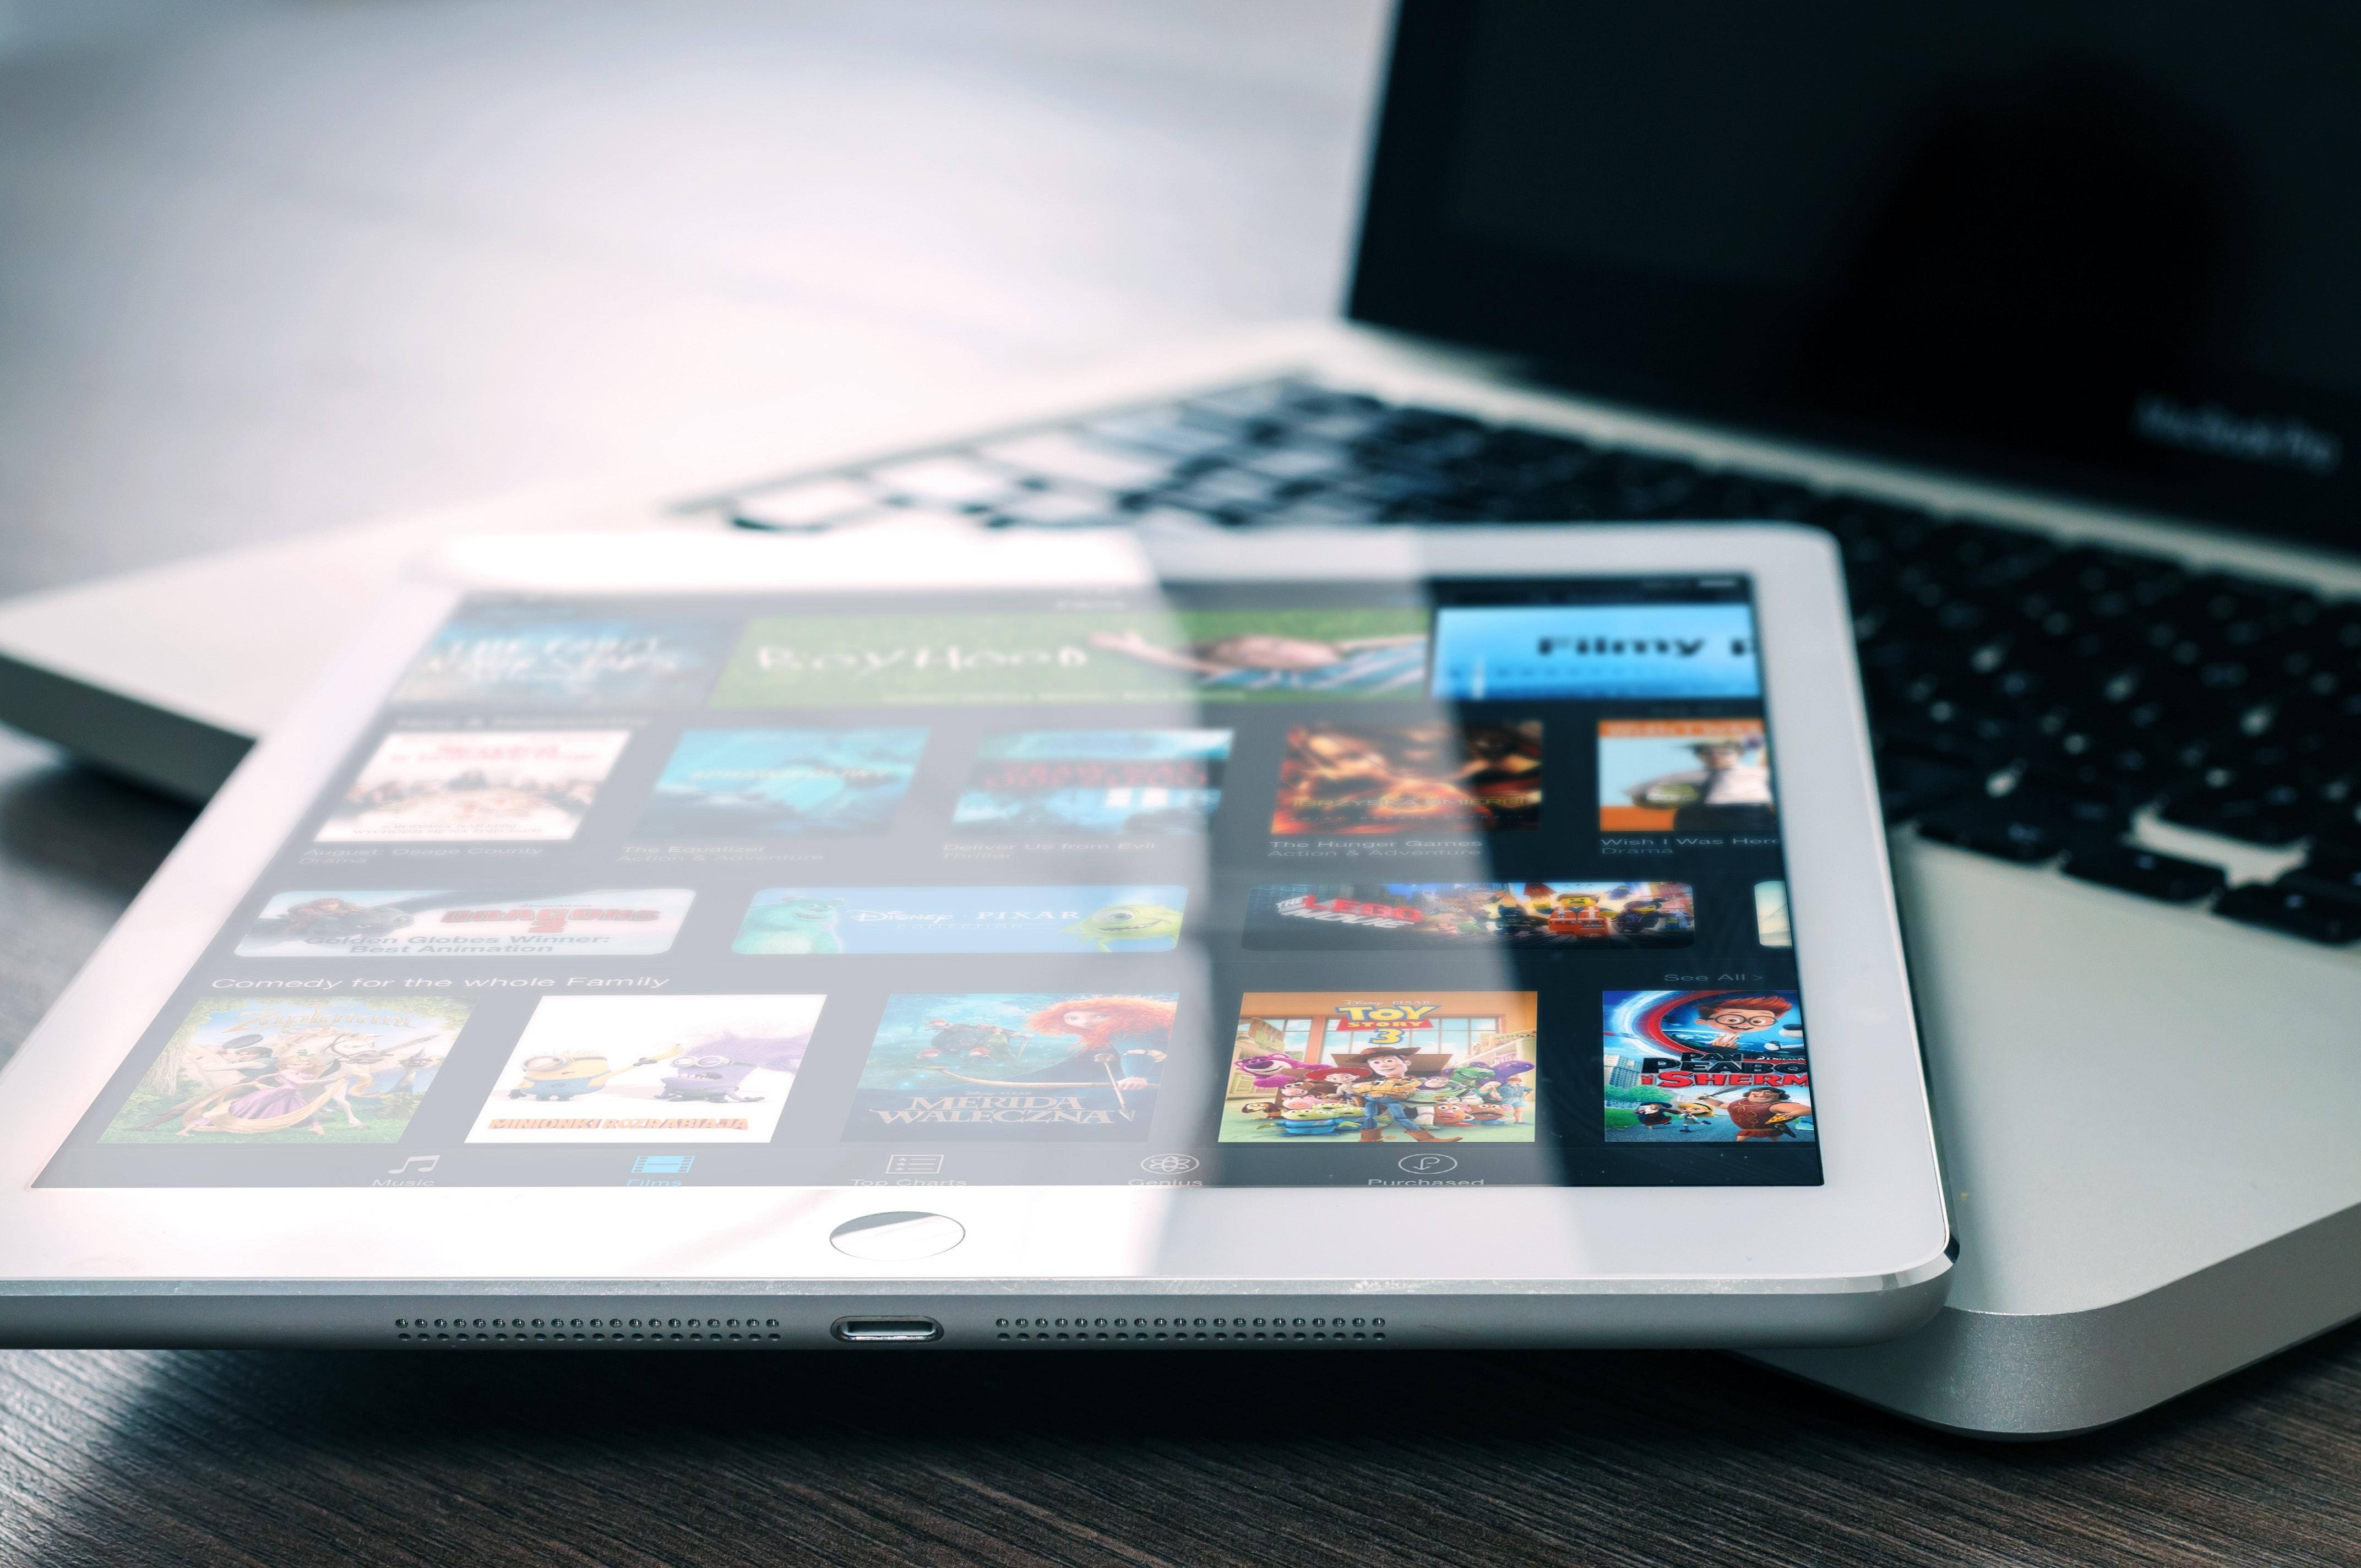 Tableta de transmisión de películas